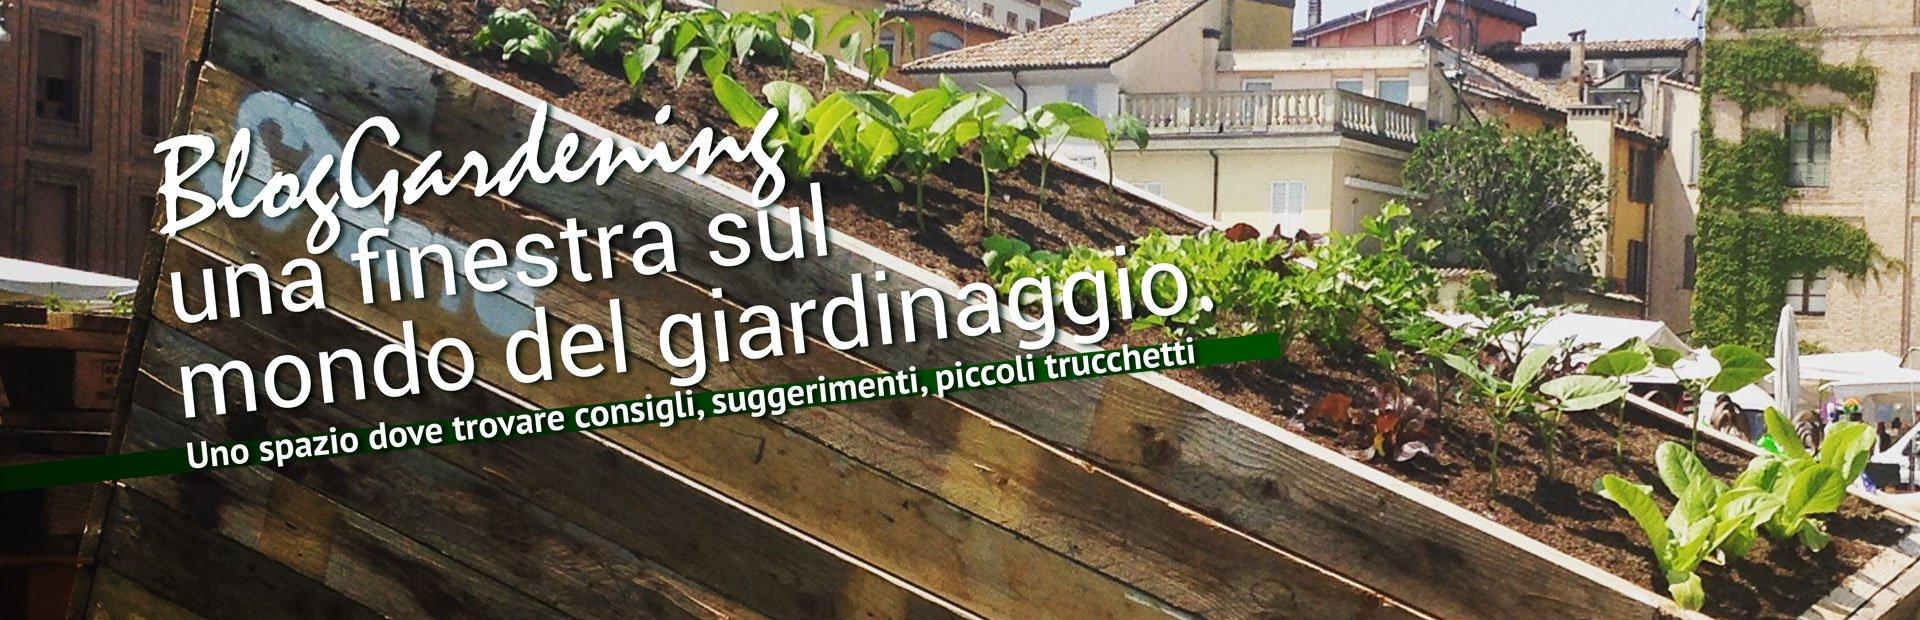 slide blogardening verde cabiria parma